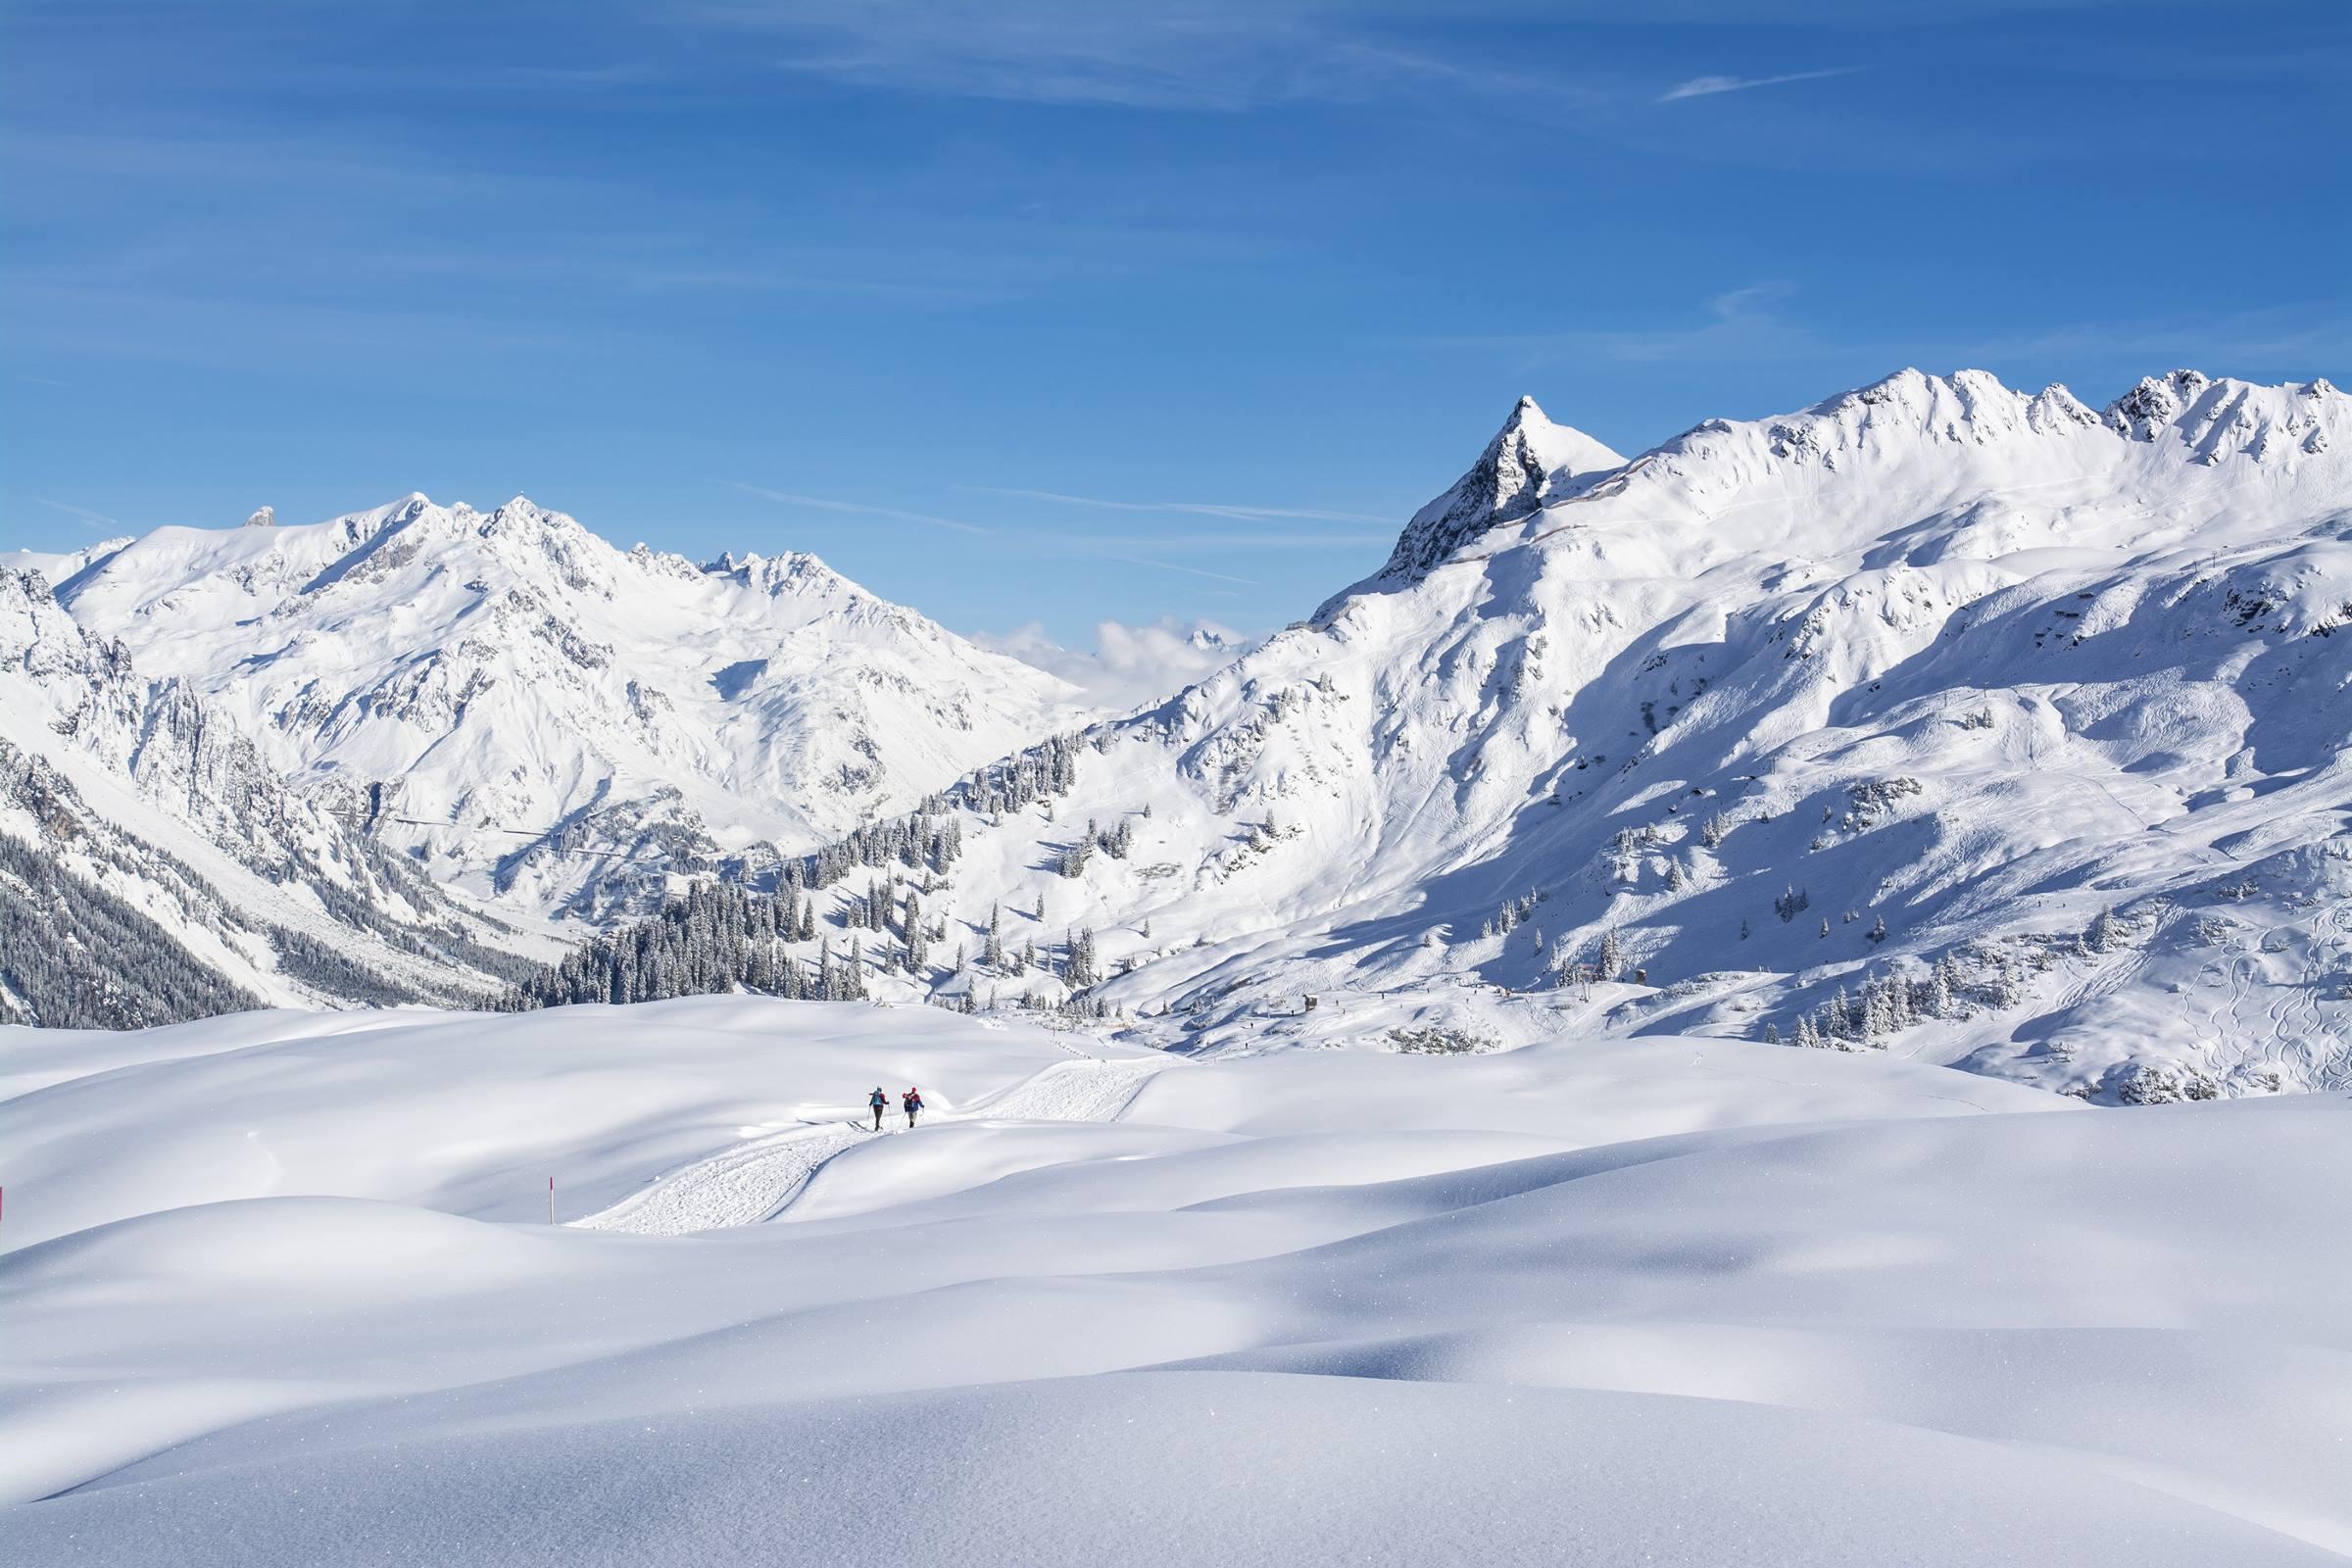 winter landscape snow mountains alps walkers